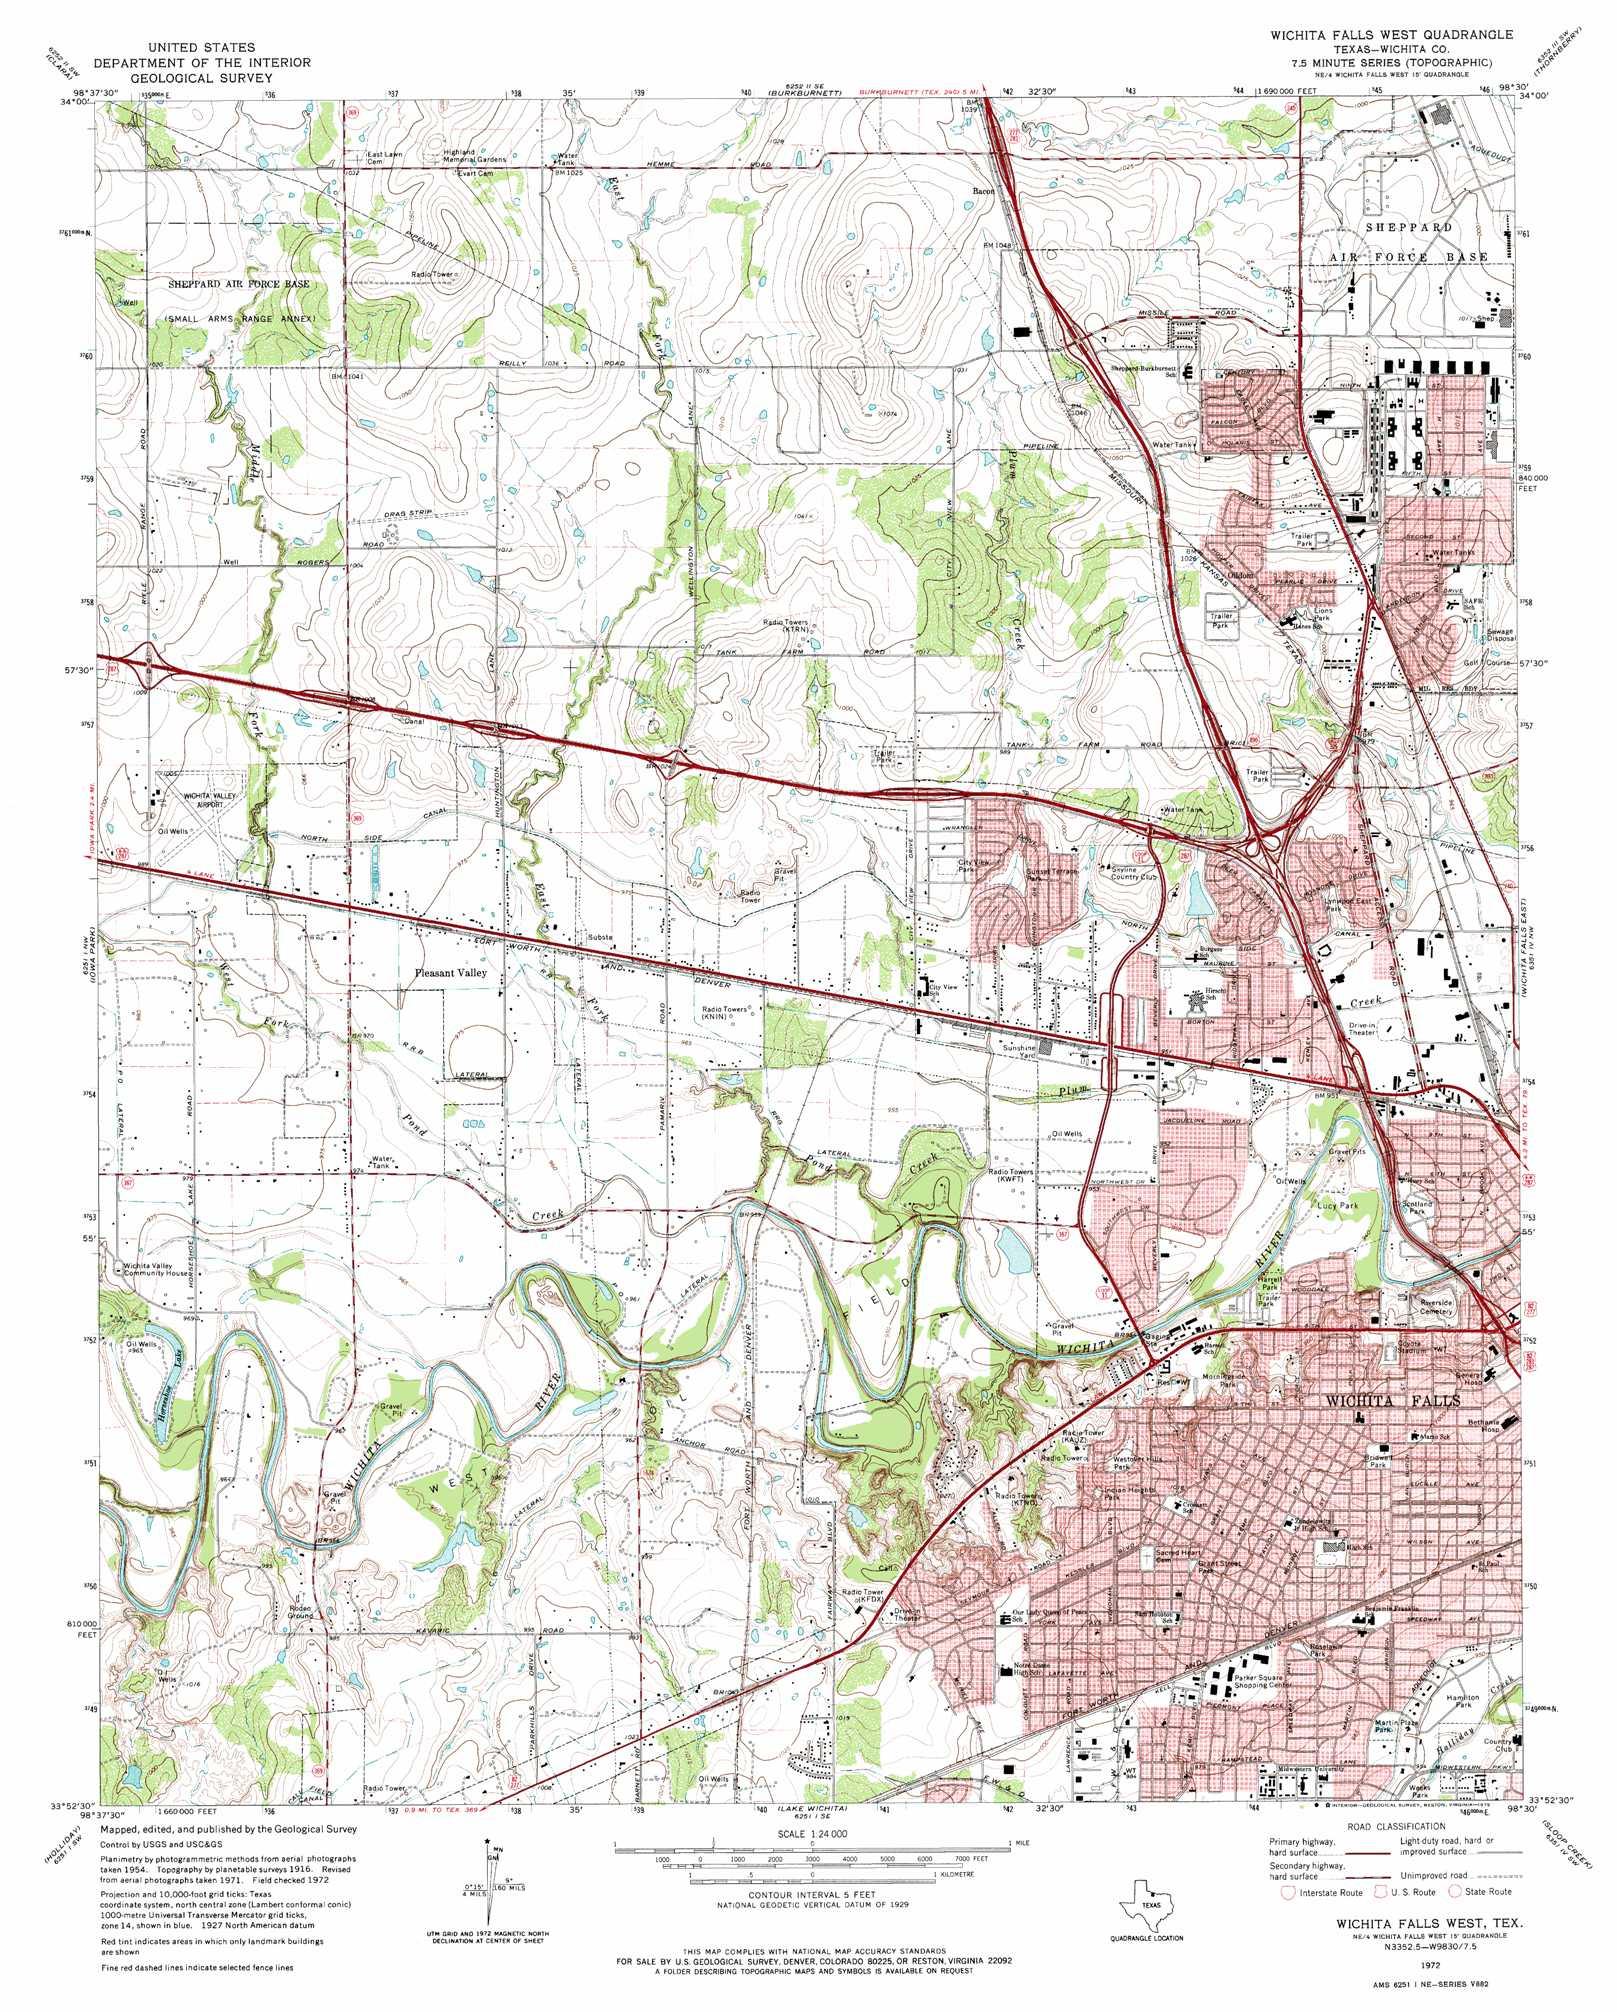 Wichita Falls West topographic map TX USGS Topo Quad 33098h5